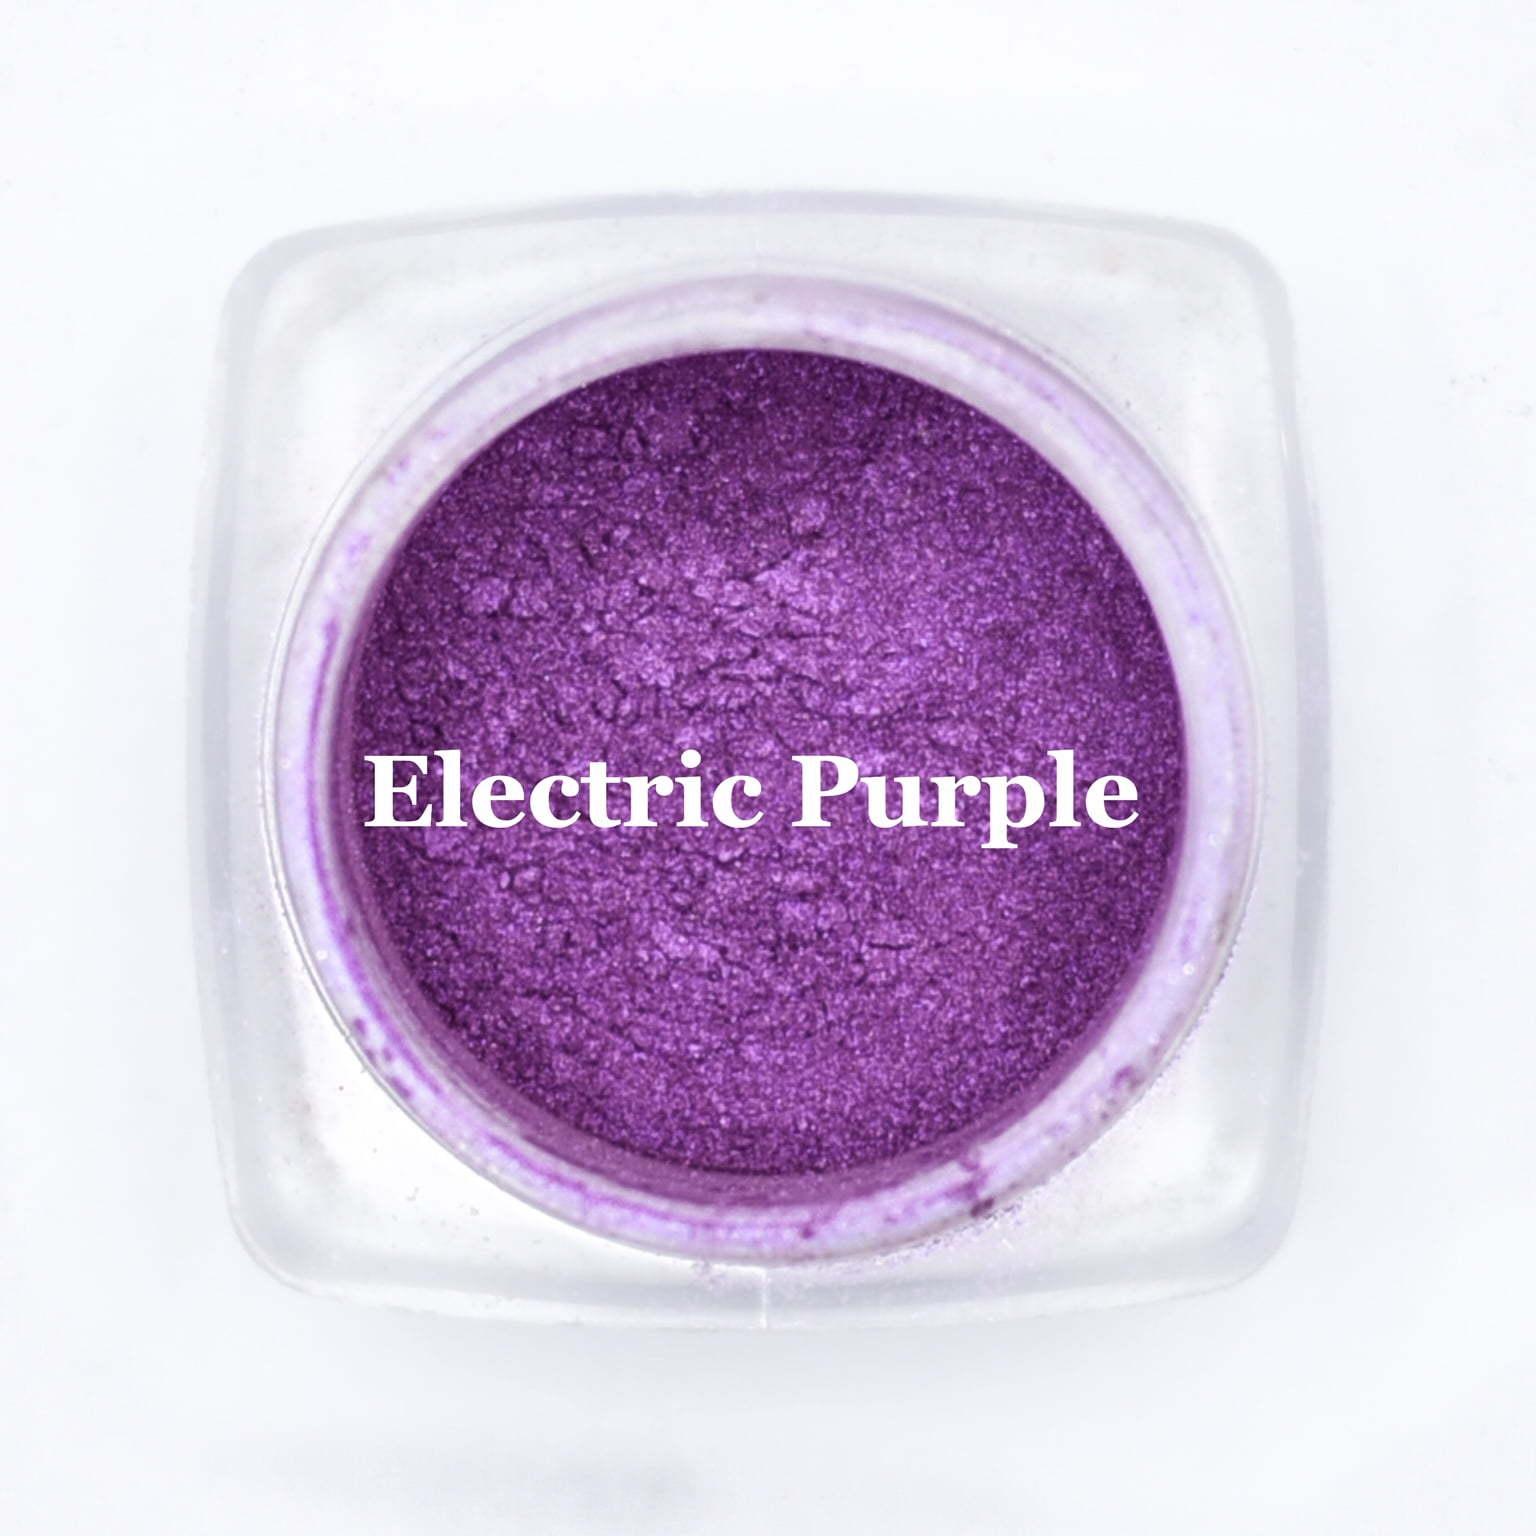 eye shadow electric purple